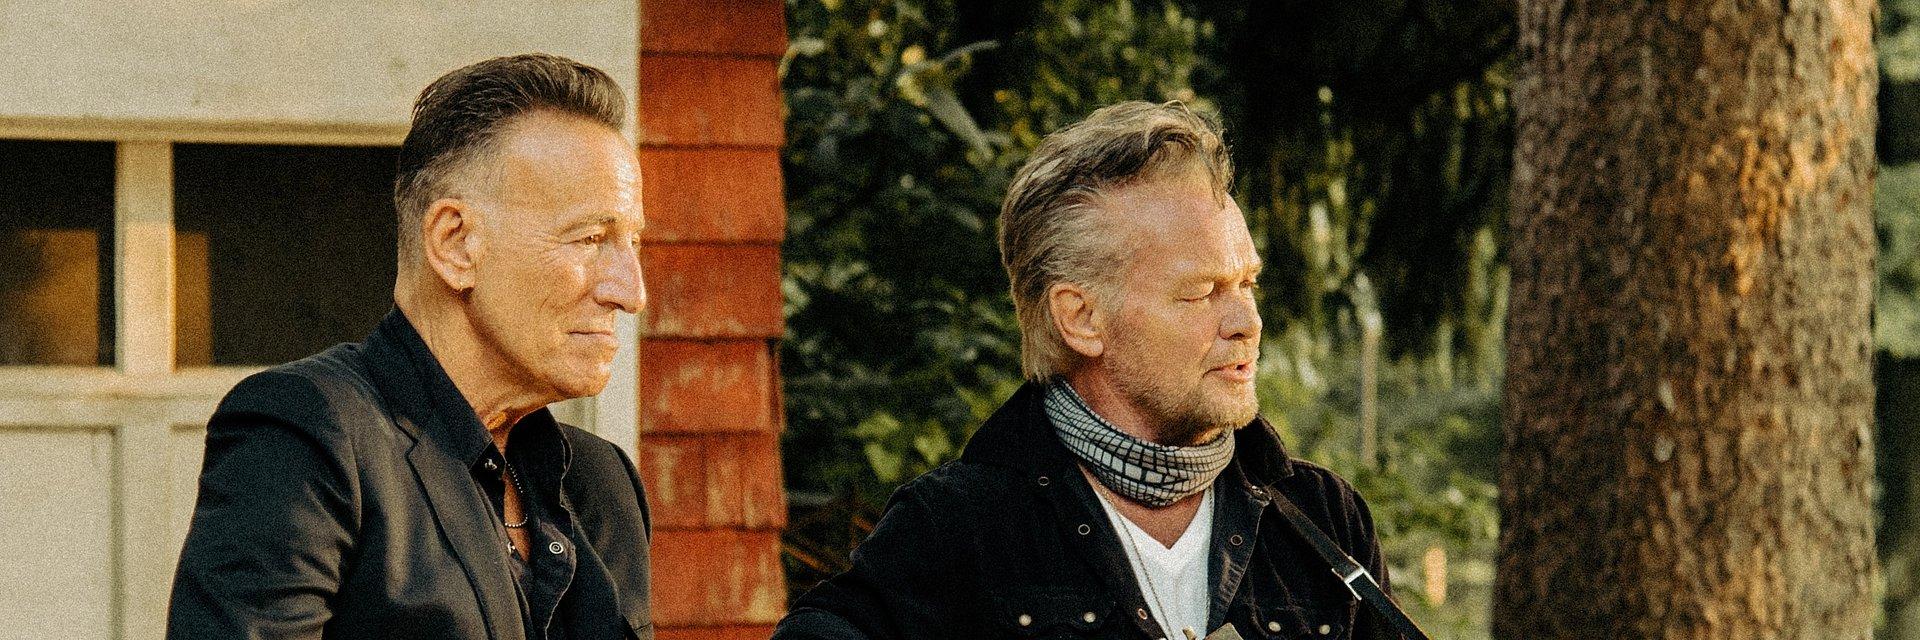 John Mellencamp i Bruce Springsteen w końcu razem